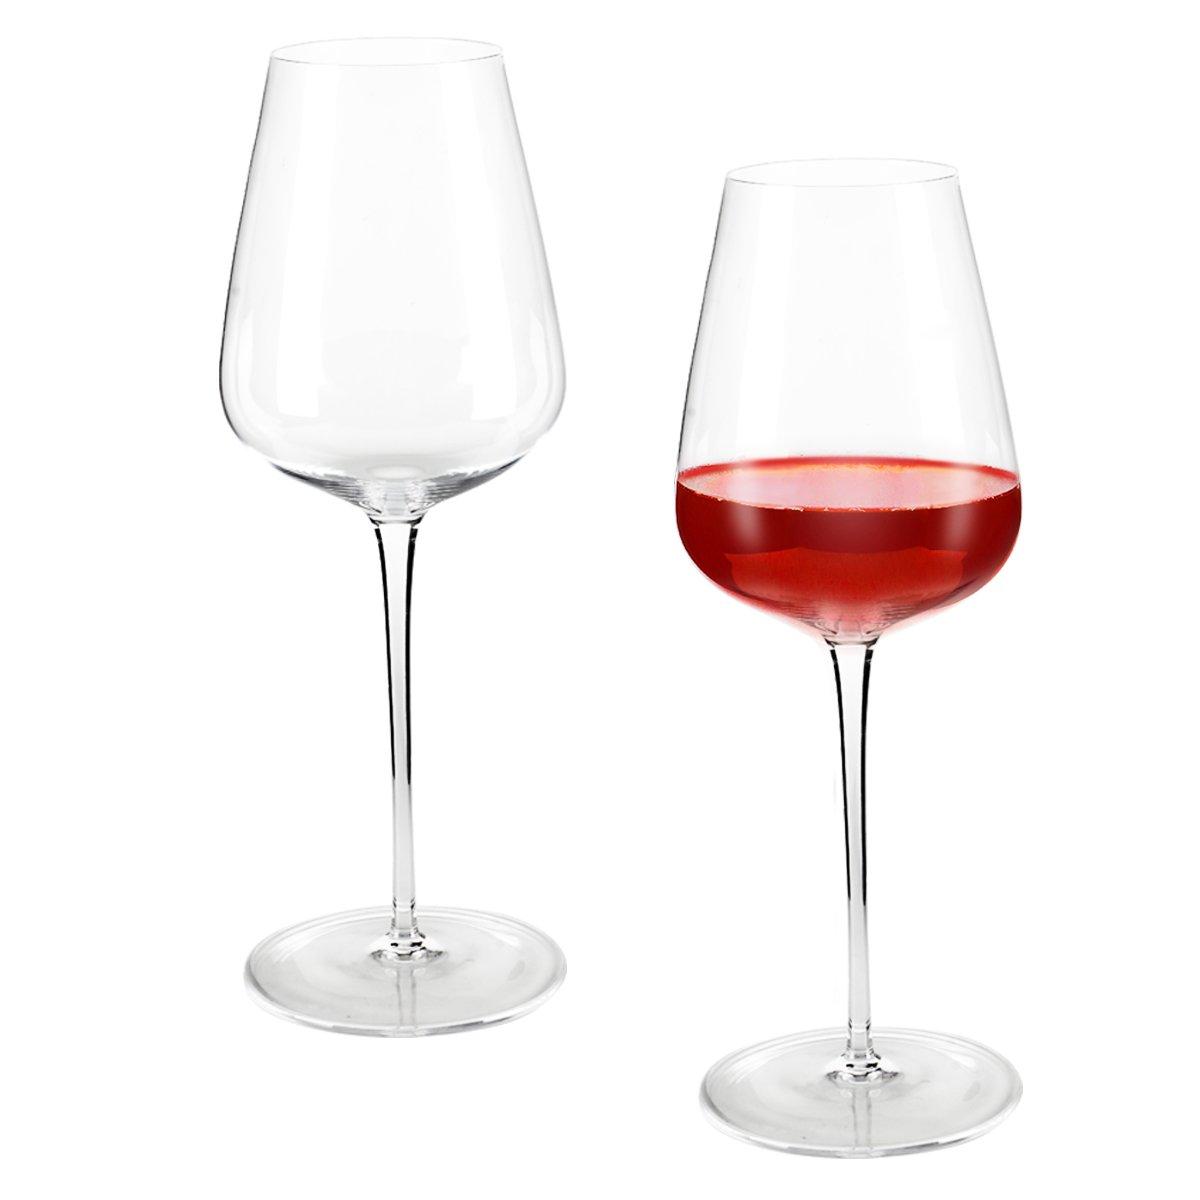 Incutex set de 2 grands verres à vin soufflés bouche verres vin cristal géants XXL 700ml big wine glasses